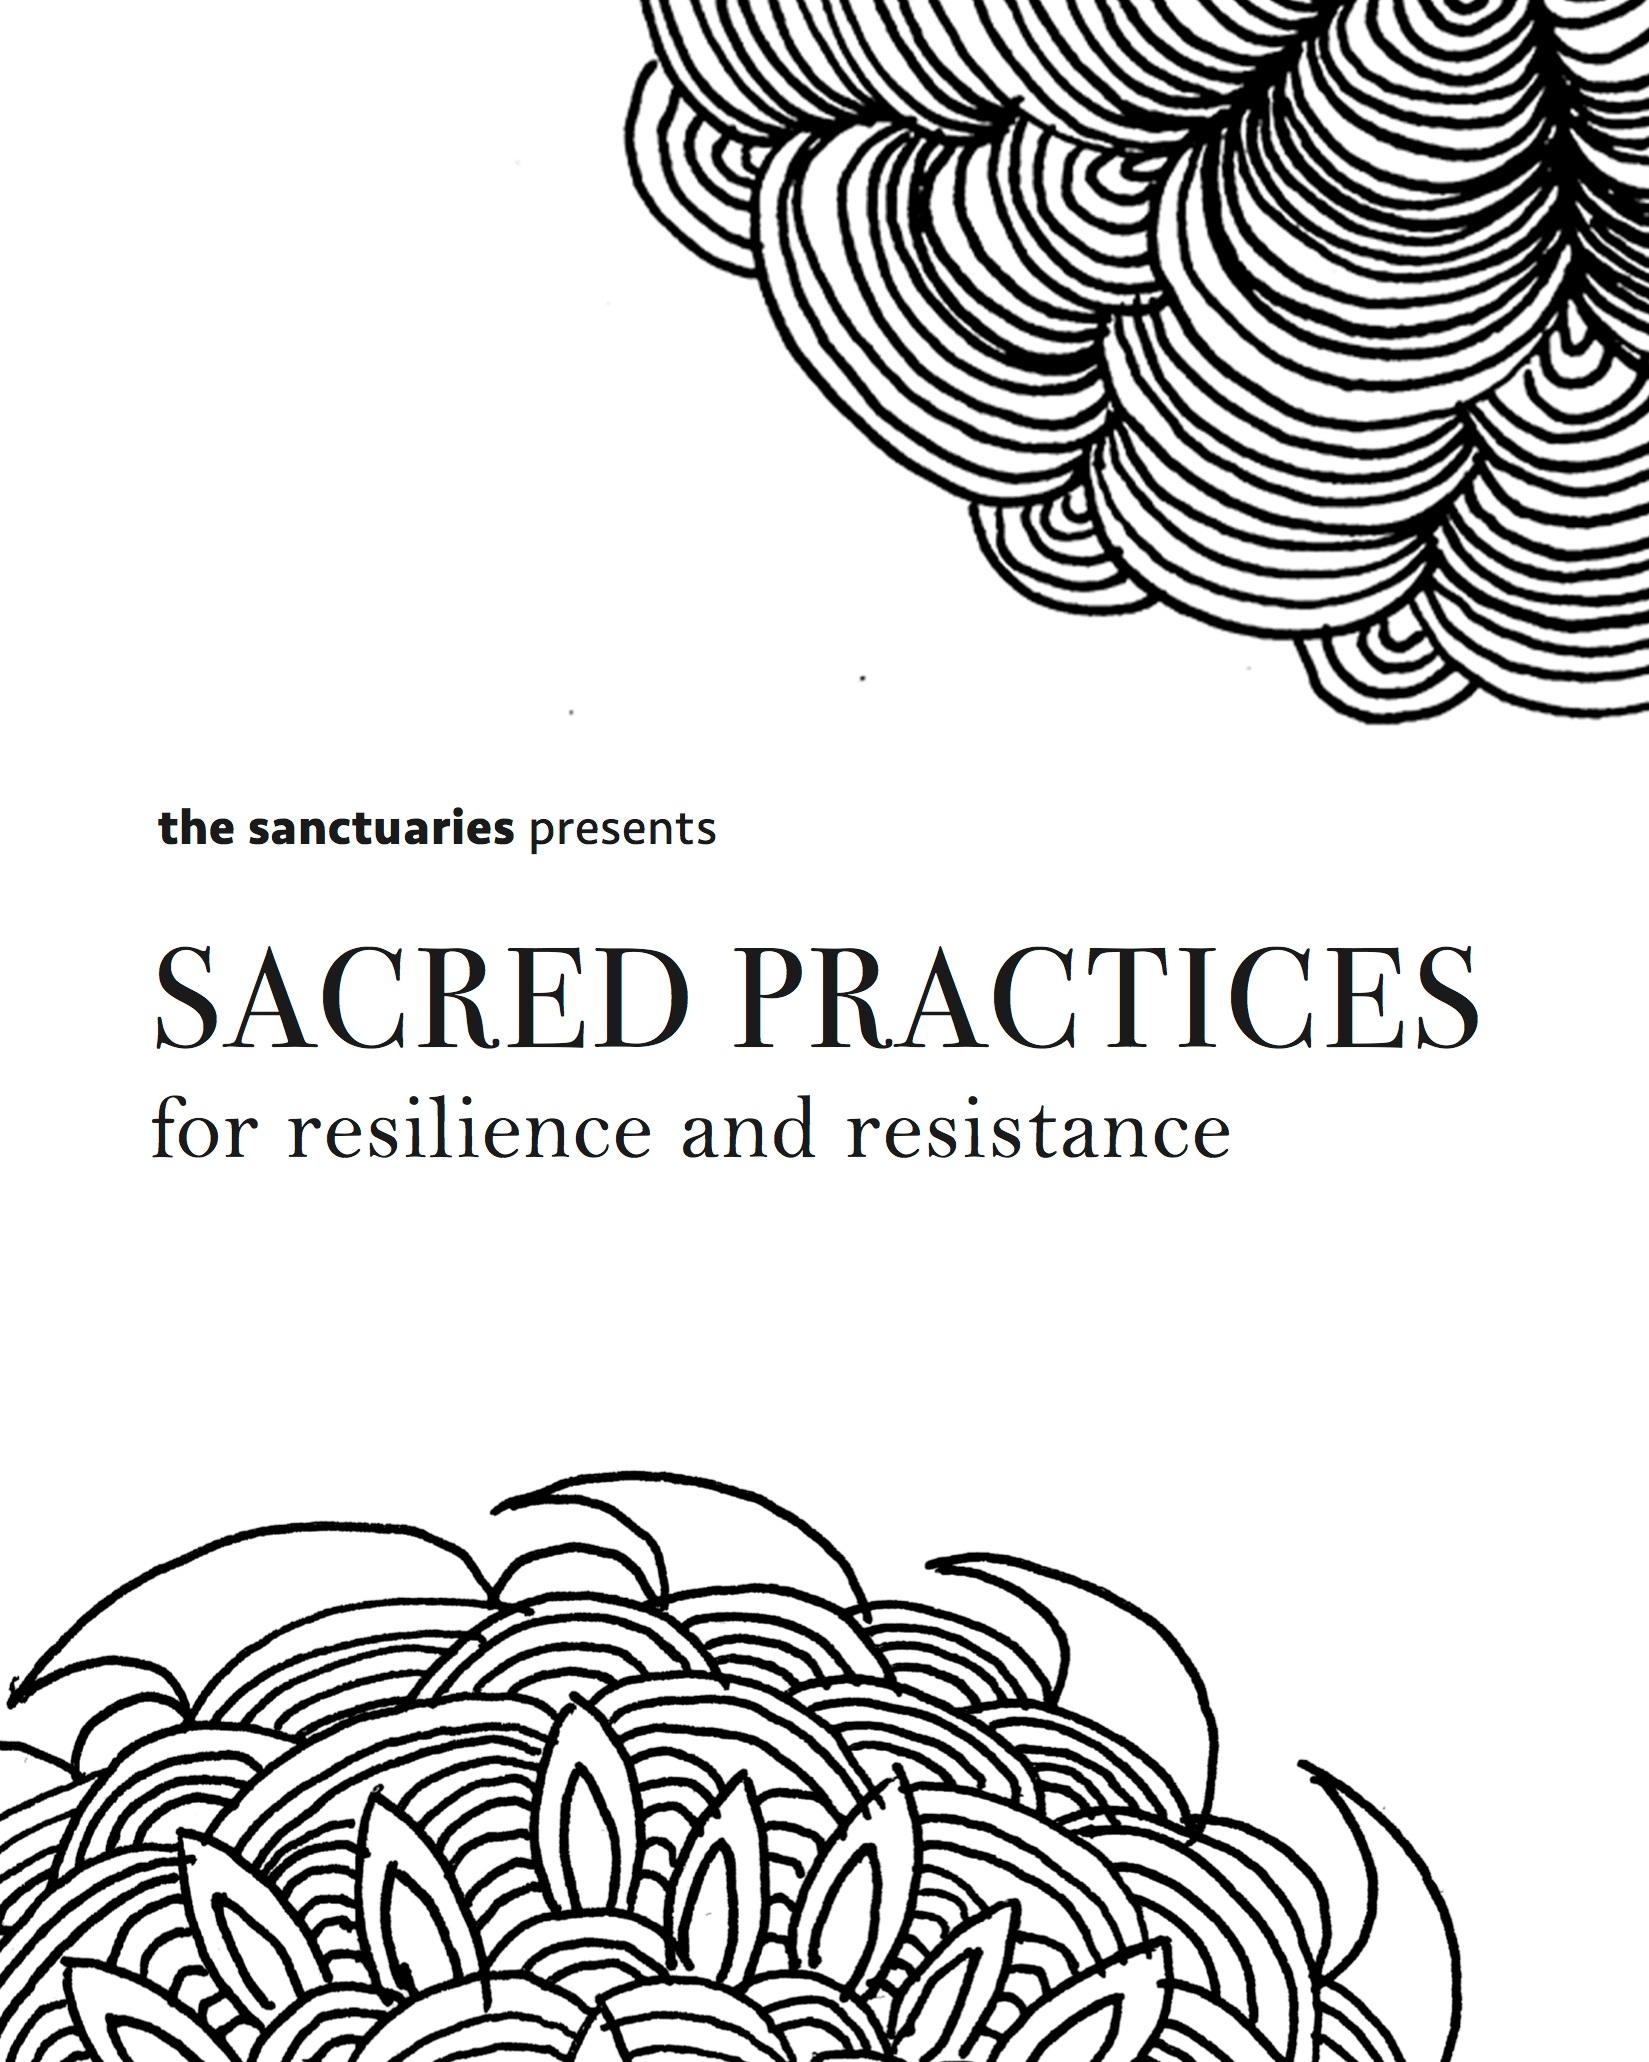 Sacred+Practices+-+Sanctuaries+DC+%281%29.jpg